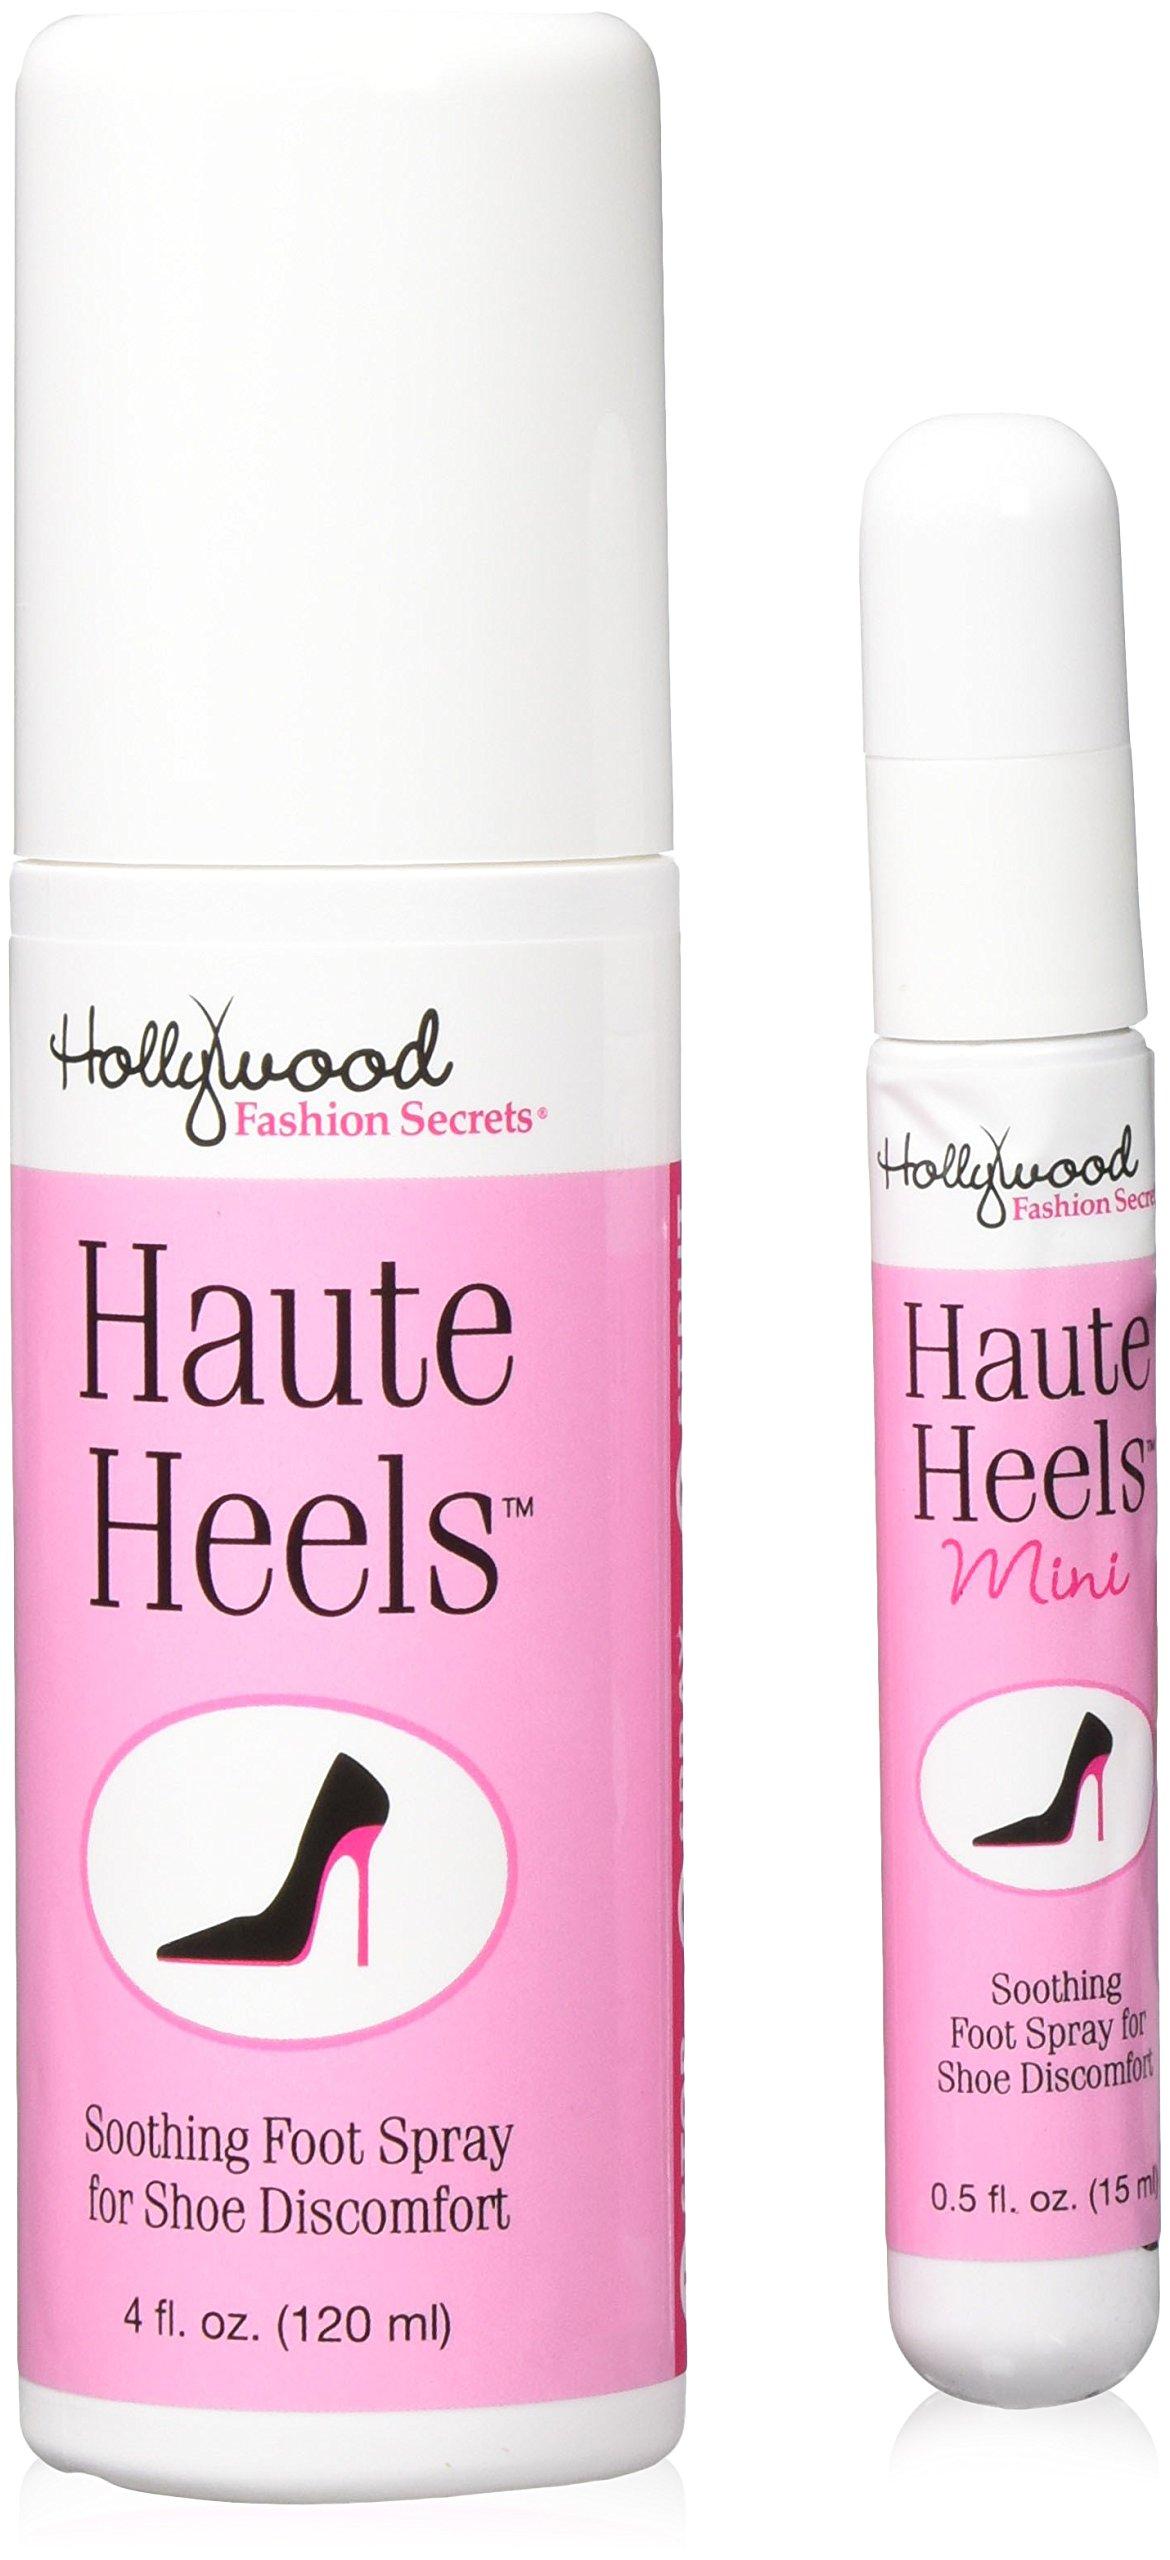 Hollywood Fashion Secrets Haute Heels Value Pack 4 oz & .5 oz